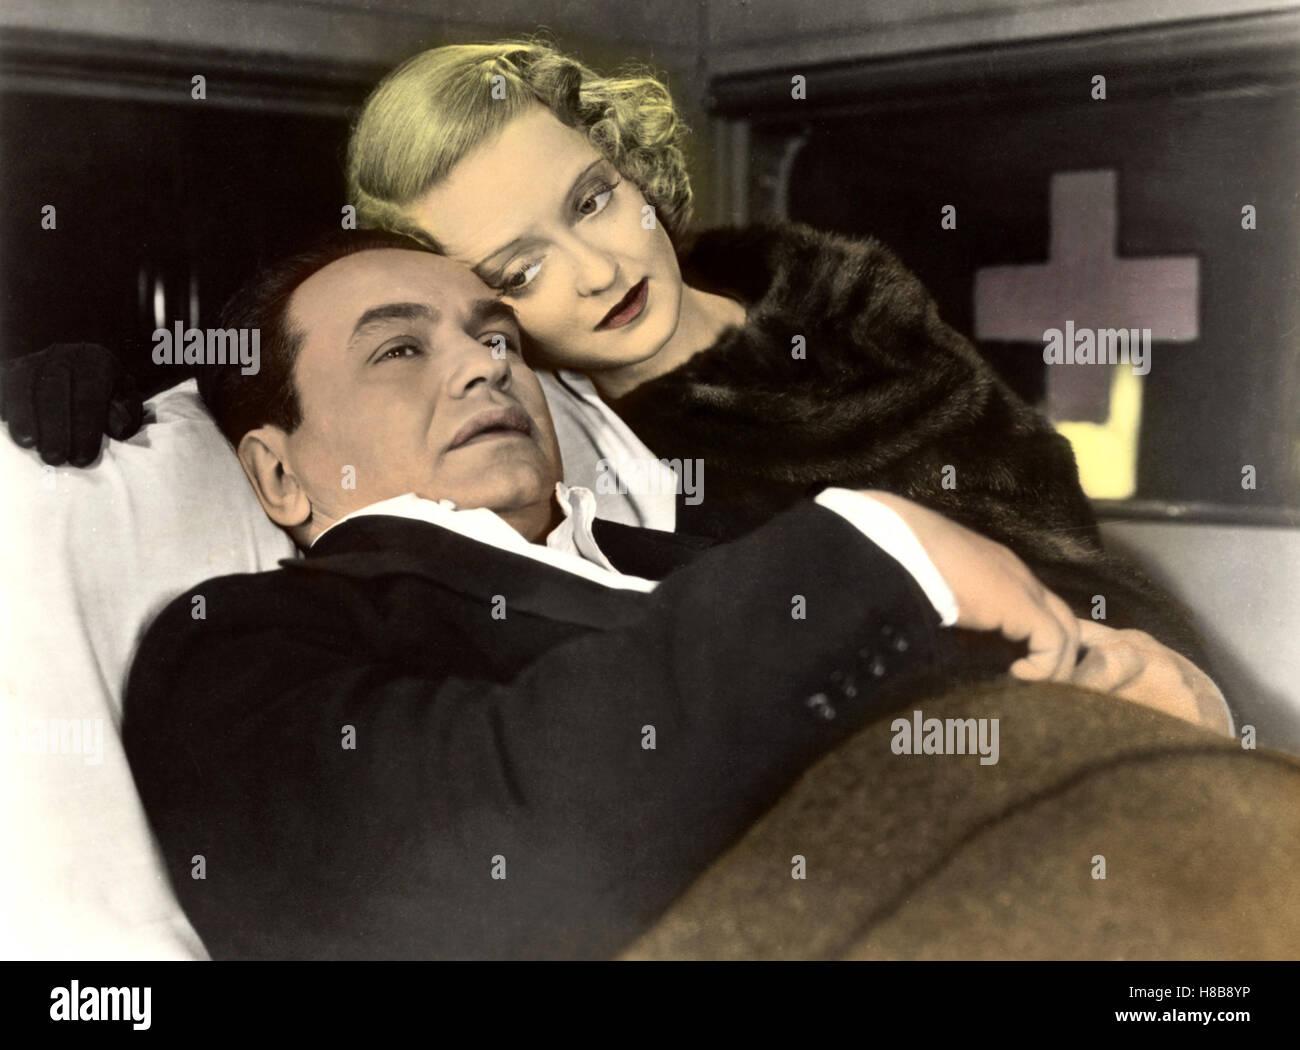 Mit harten Fäusten, (KID GALAHAD) USA 1937  s/w, Regie: Michael Curtiz, EDWARD G. ROBINSON, BETTE DAVIS,  Key: - Stock Image